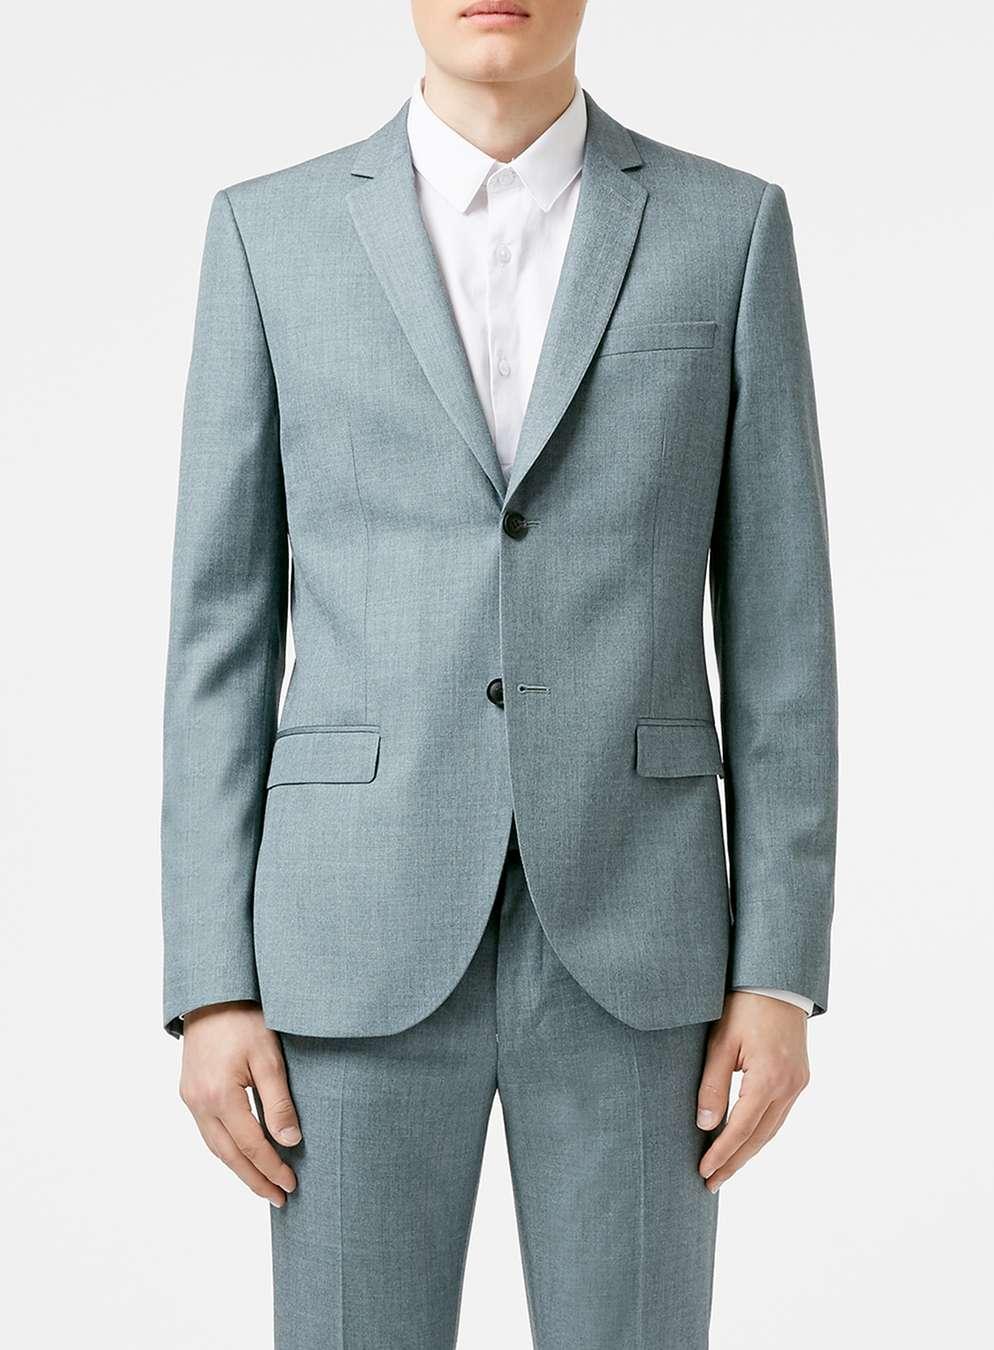 menswear, men's style, men's fashion, wardrobe essentials, summer, forties, summer essentials, summer style, fifties, 50s style essentials, casual suit, suit